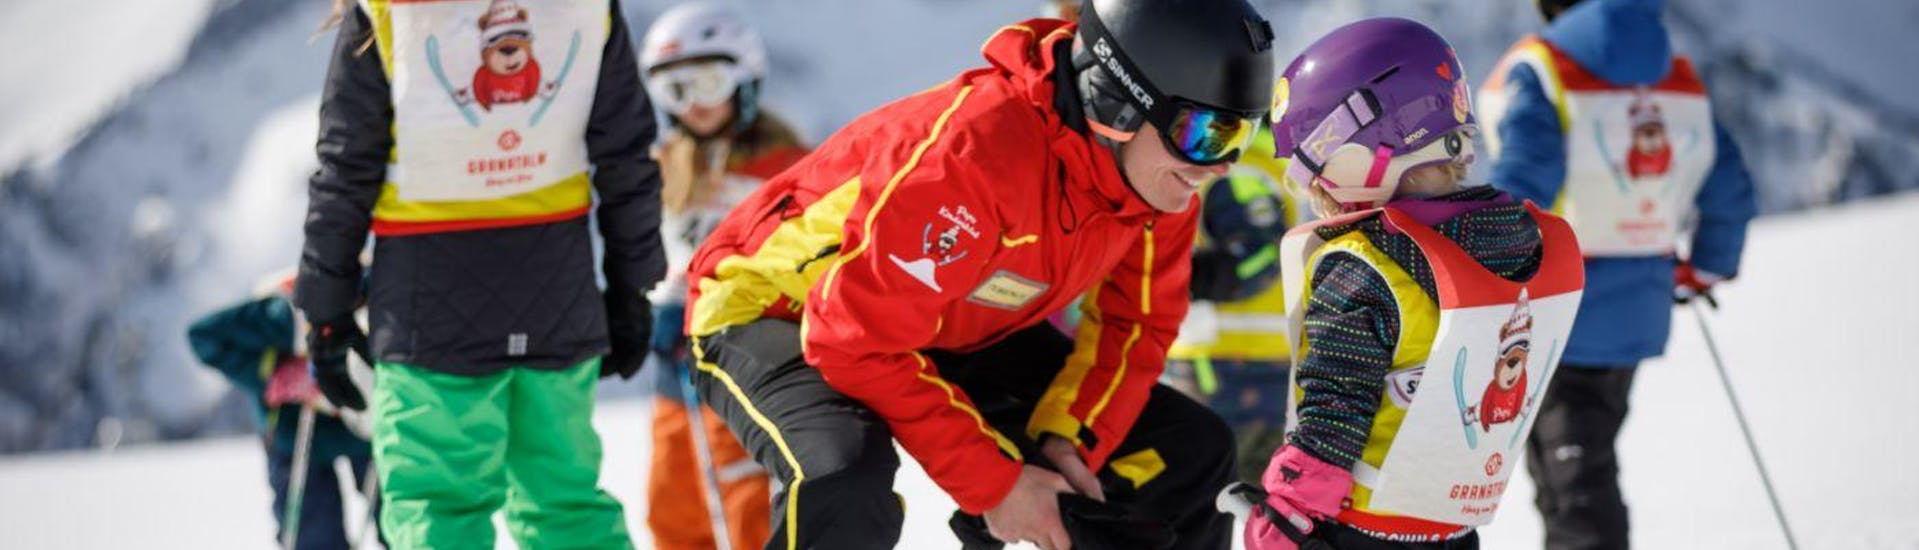 Kids Ski Lessons (4-14 y.) for Beginners with Skischule Sunny Finkenberg - Hero image